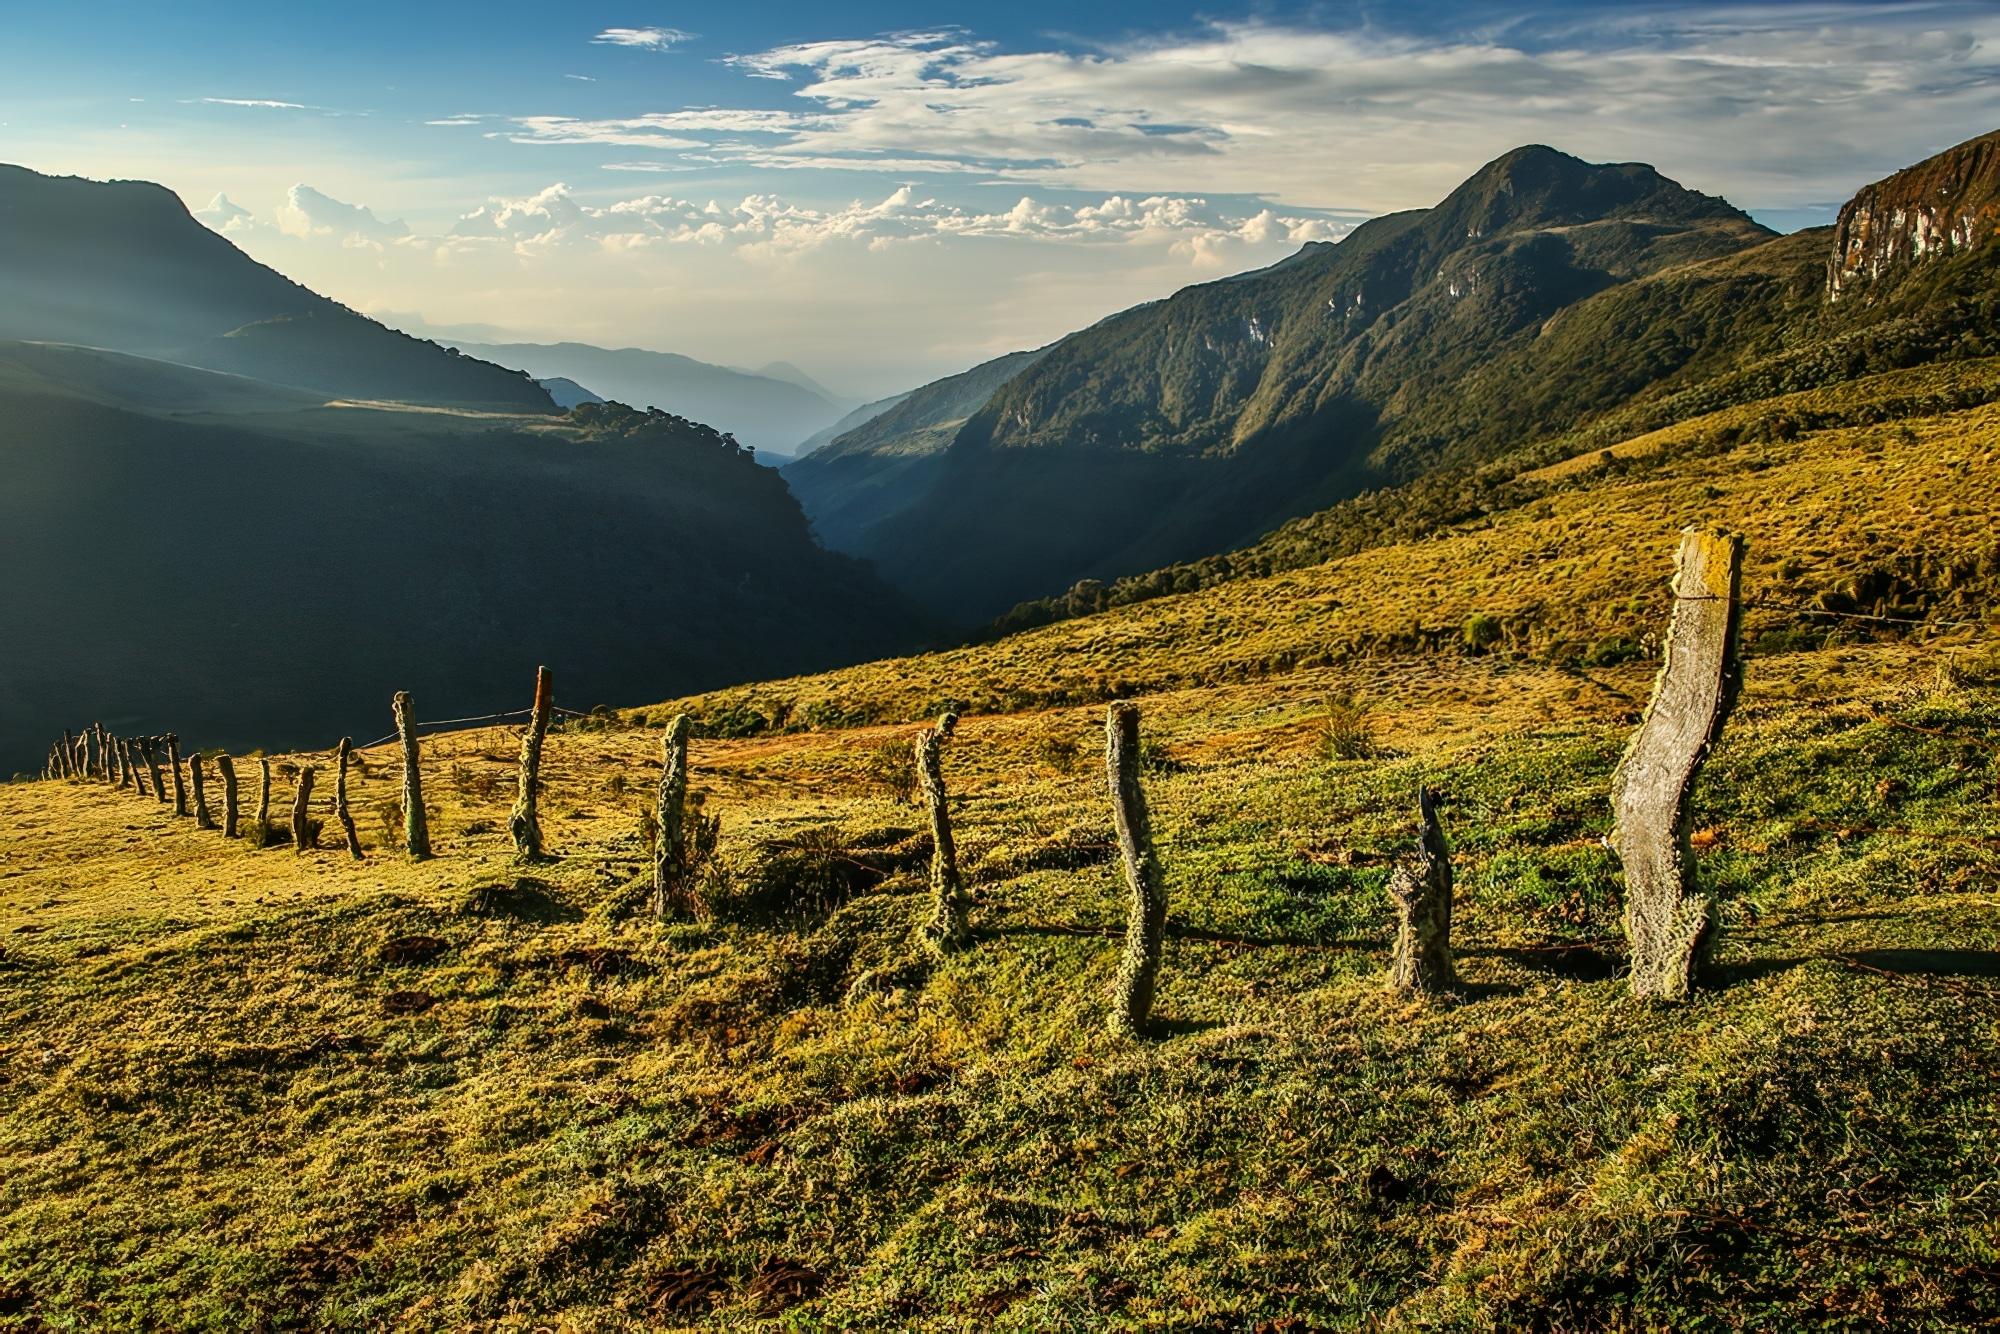 Visiter le Parc Naturel Los Nevados en Colombie